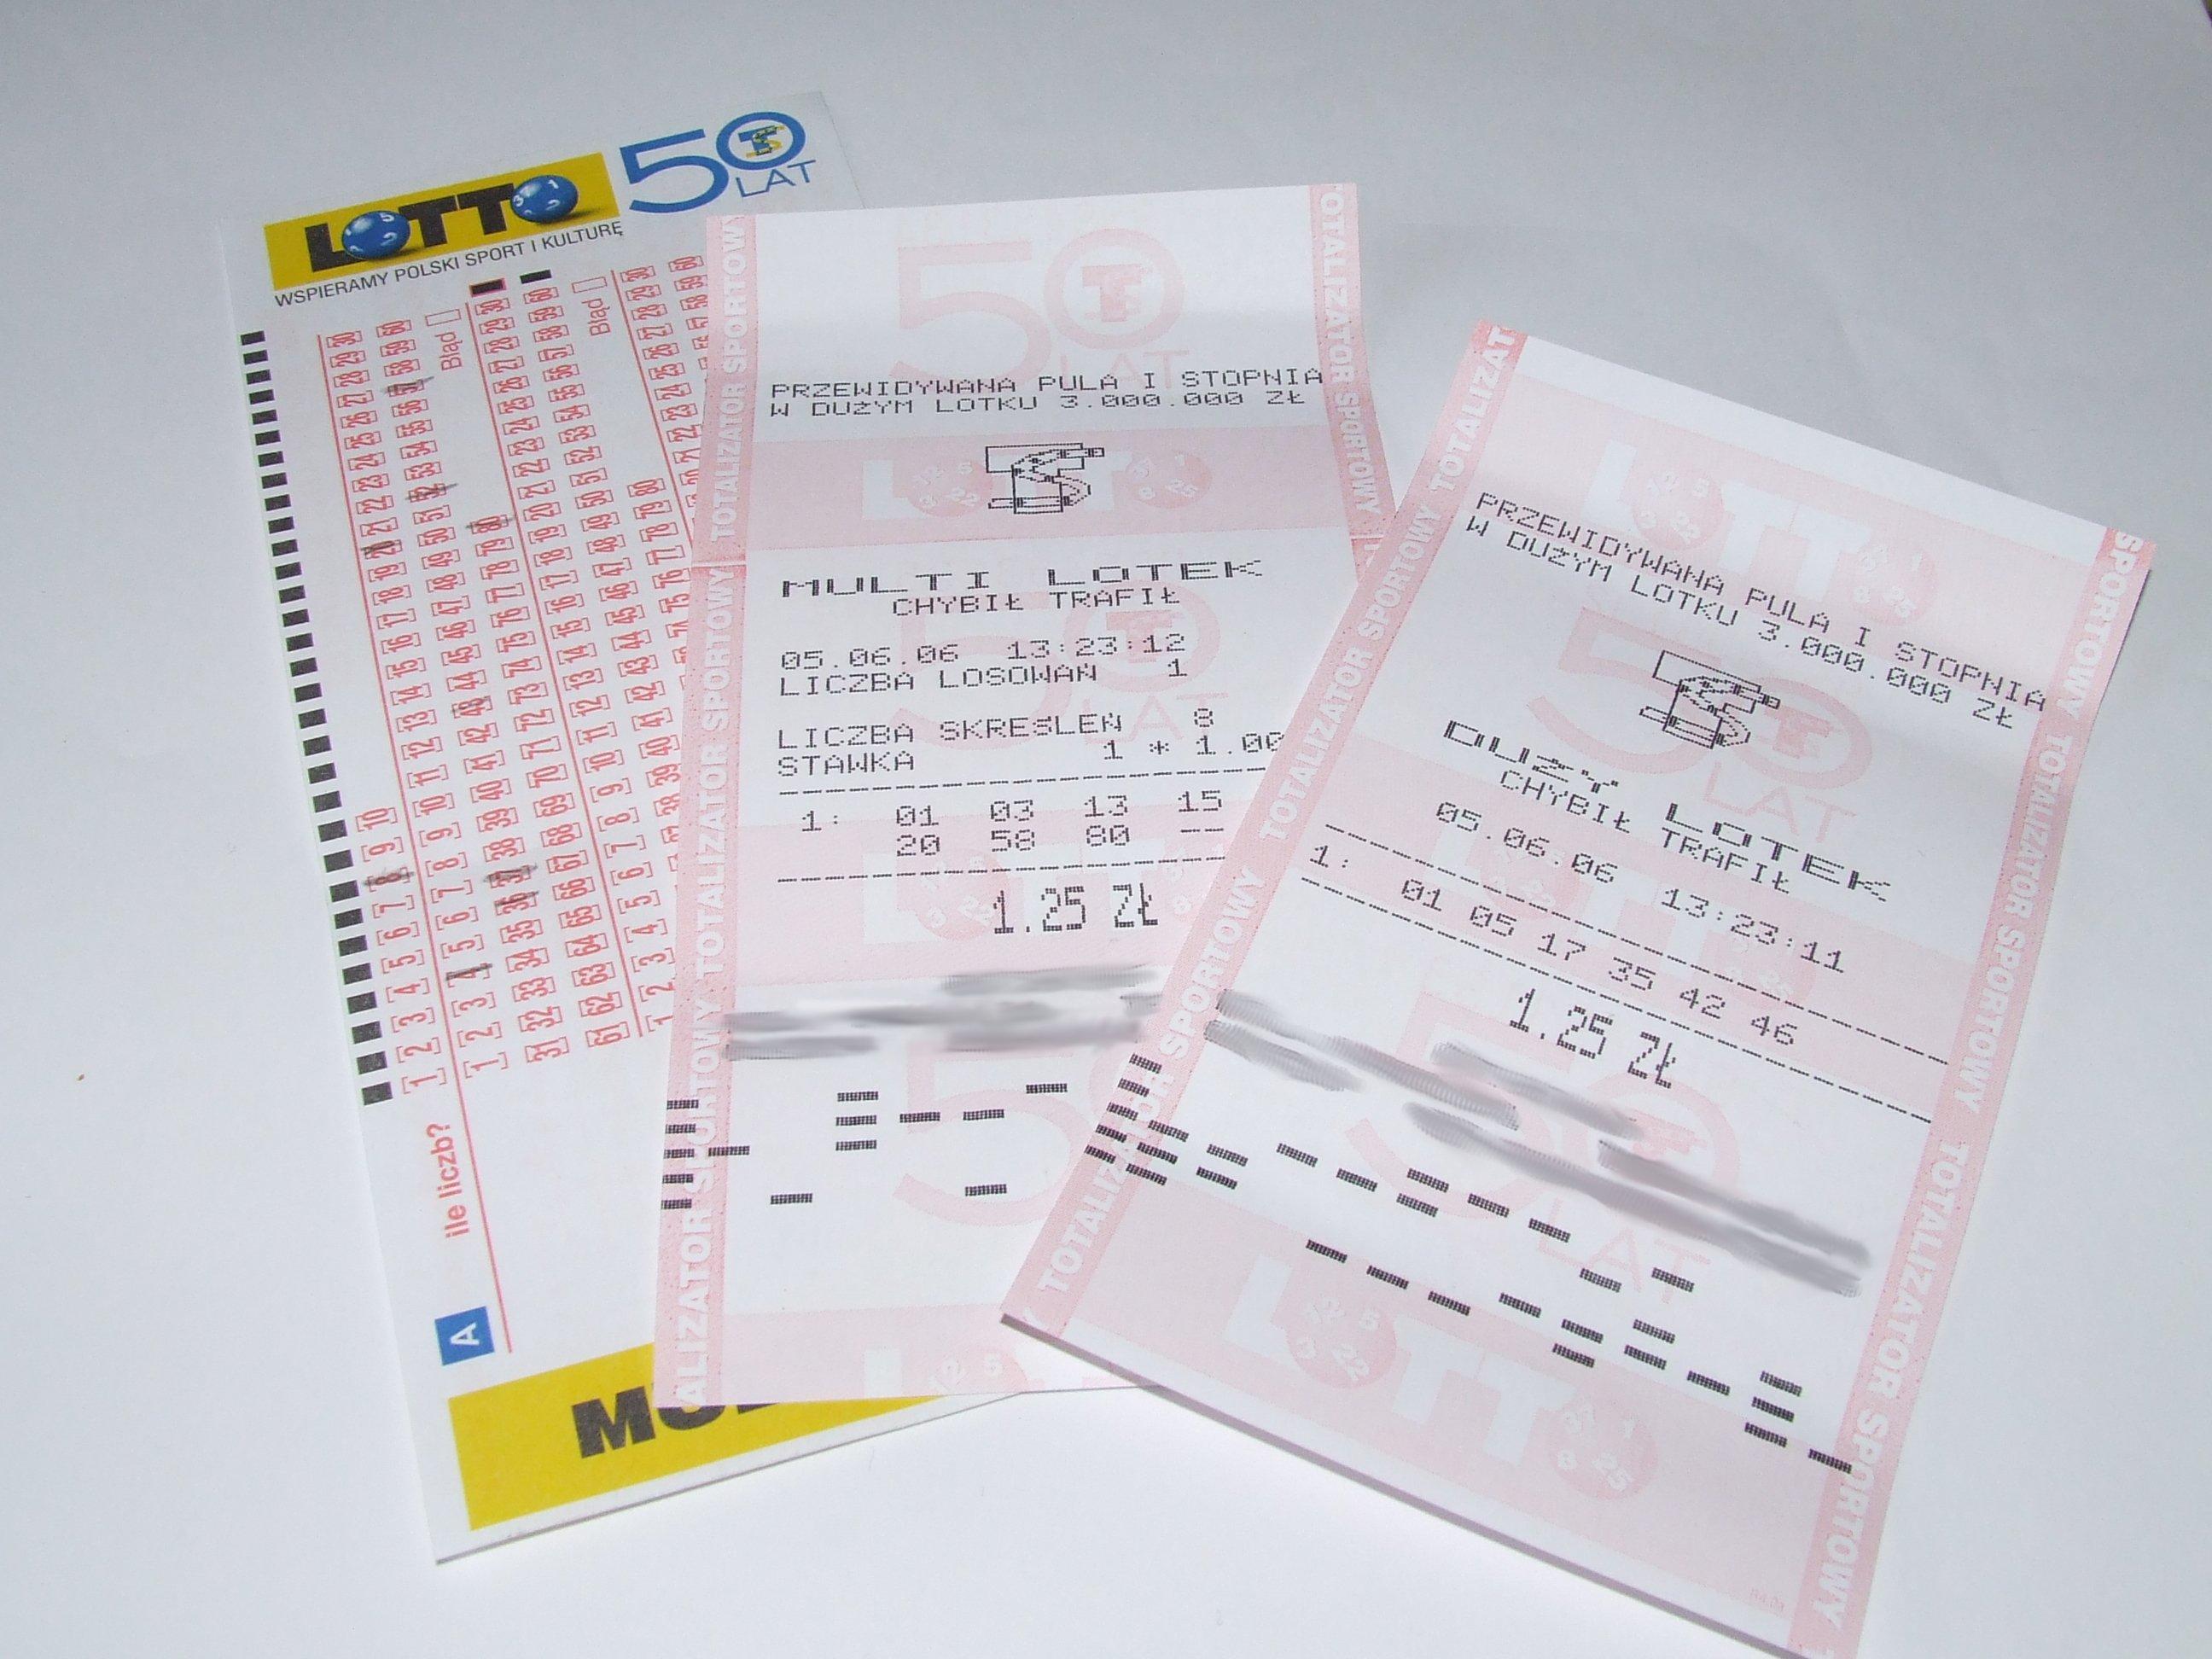 Loteria esportiva inglesa 53015